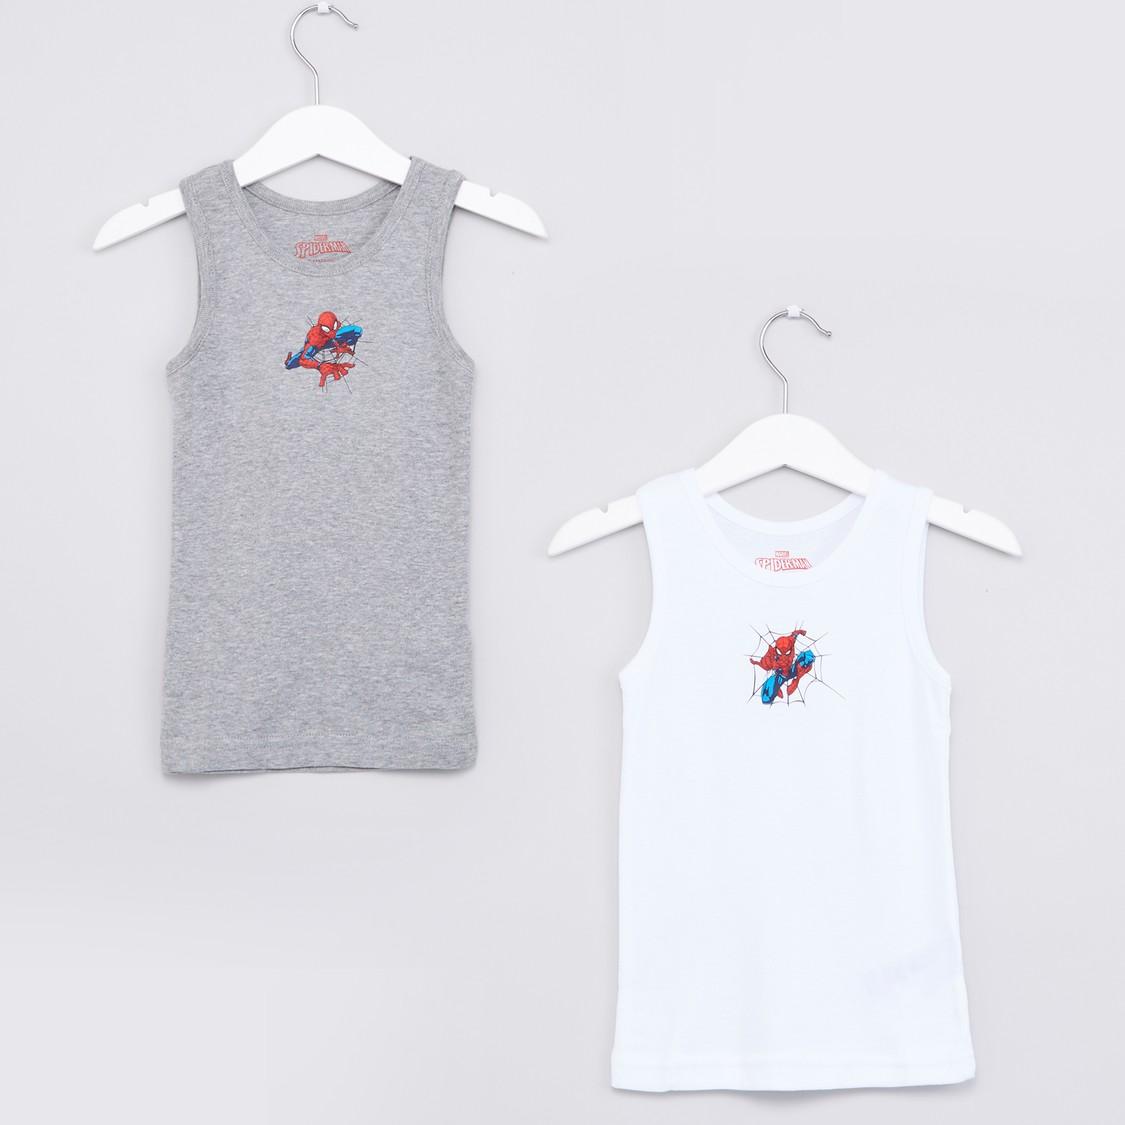 Spider-Man Printed Sleeveless Vest - Set of 2